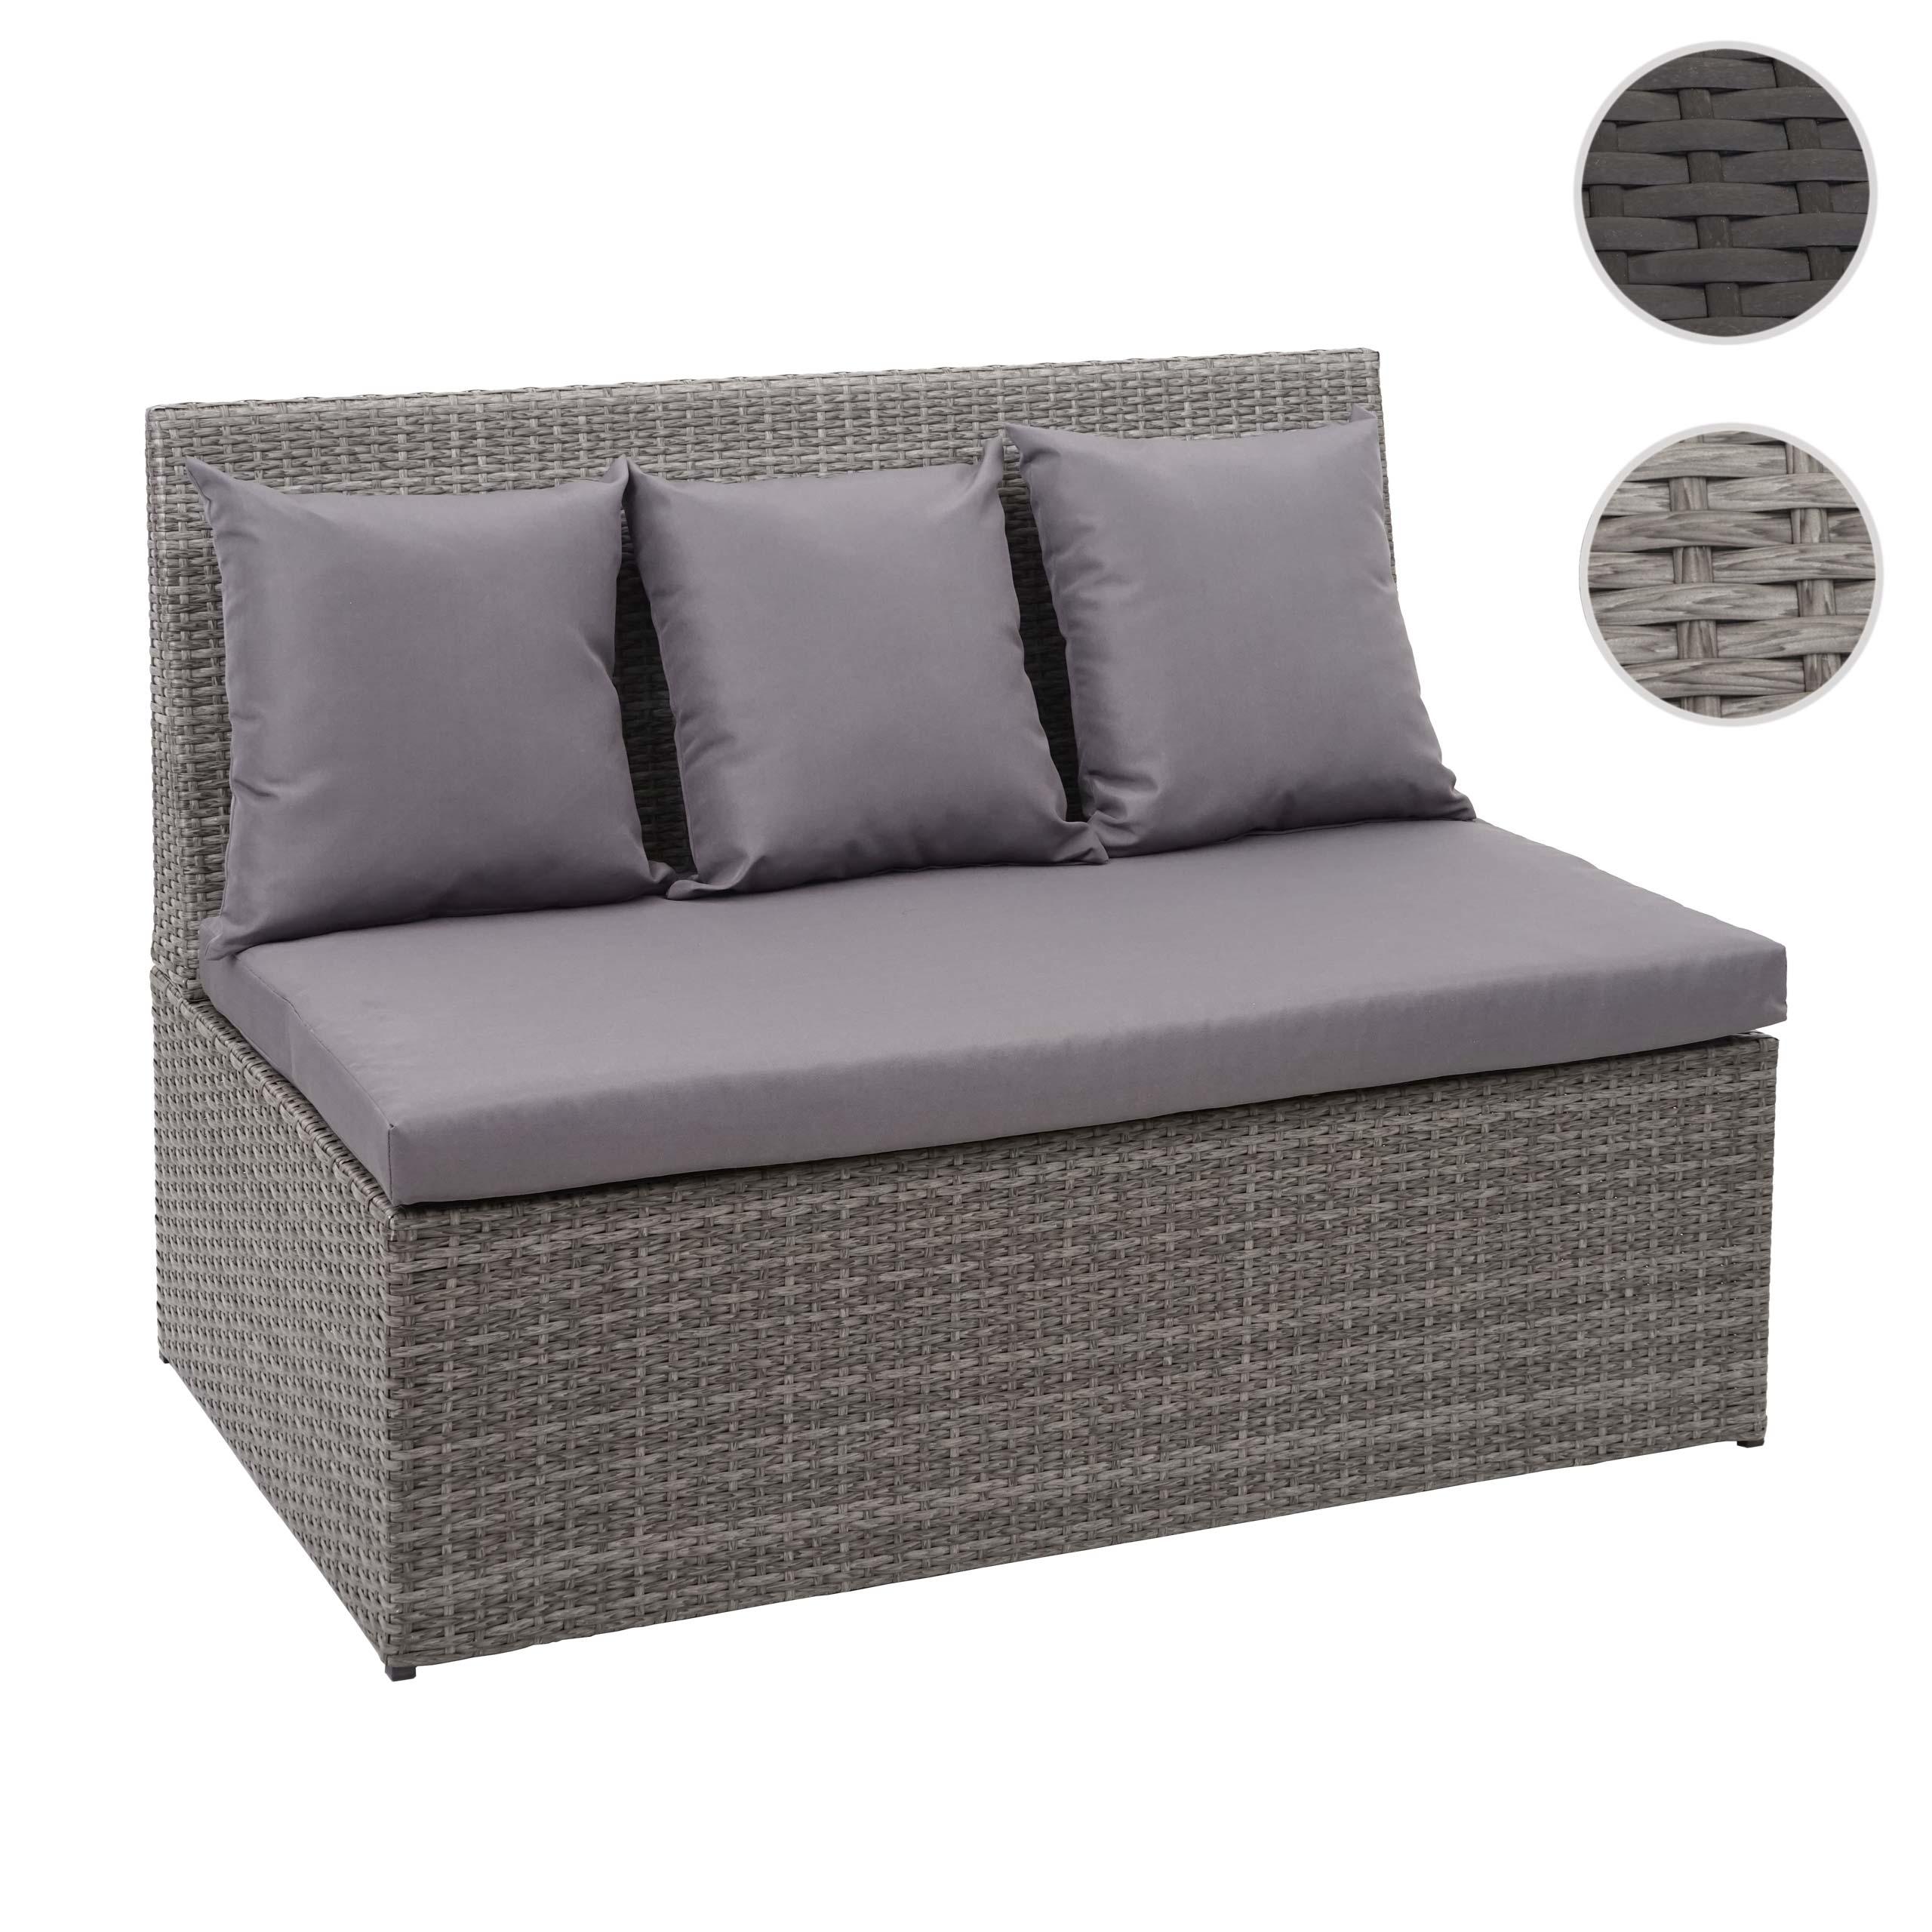 Mendler Poly-Rattan 2er Sofa HWC-G16, Lounge-Gartenbank Sitzbank Sessel, Gastronomie 120cm ~ Variantenangebo 70868